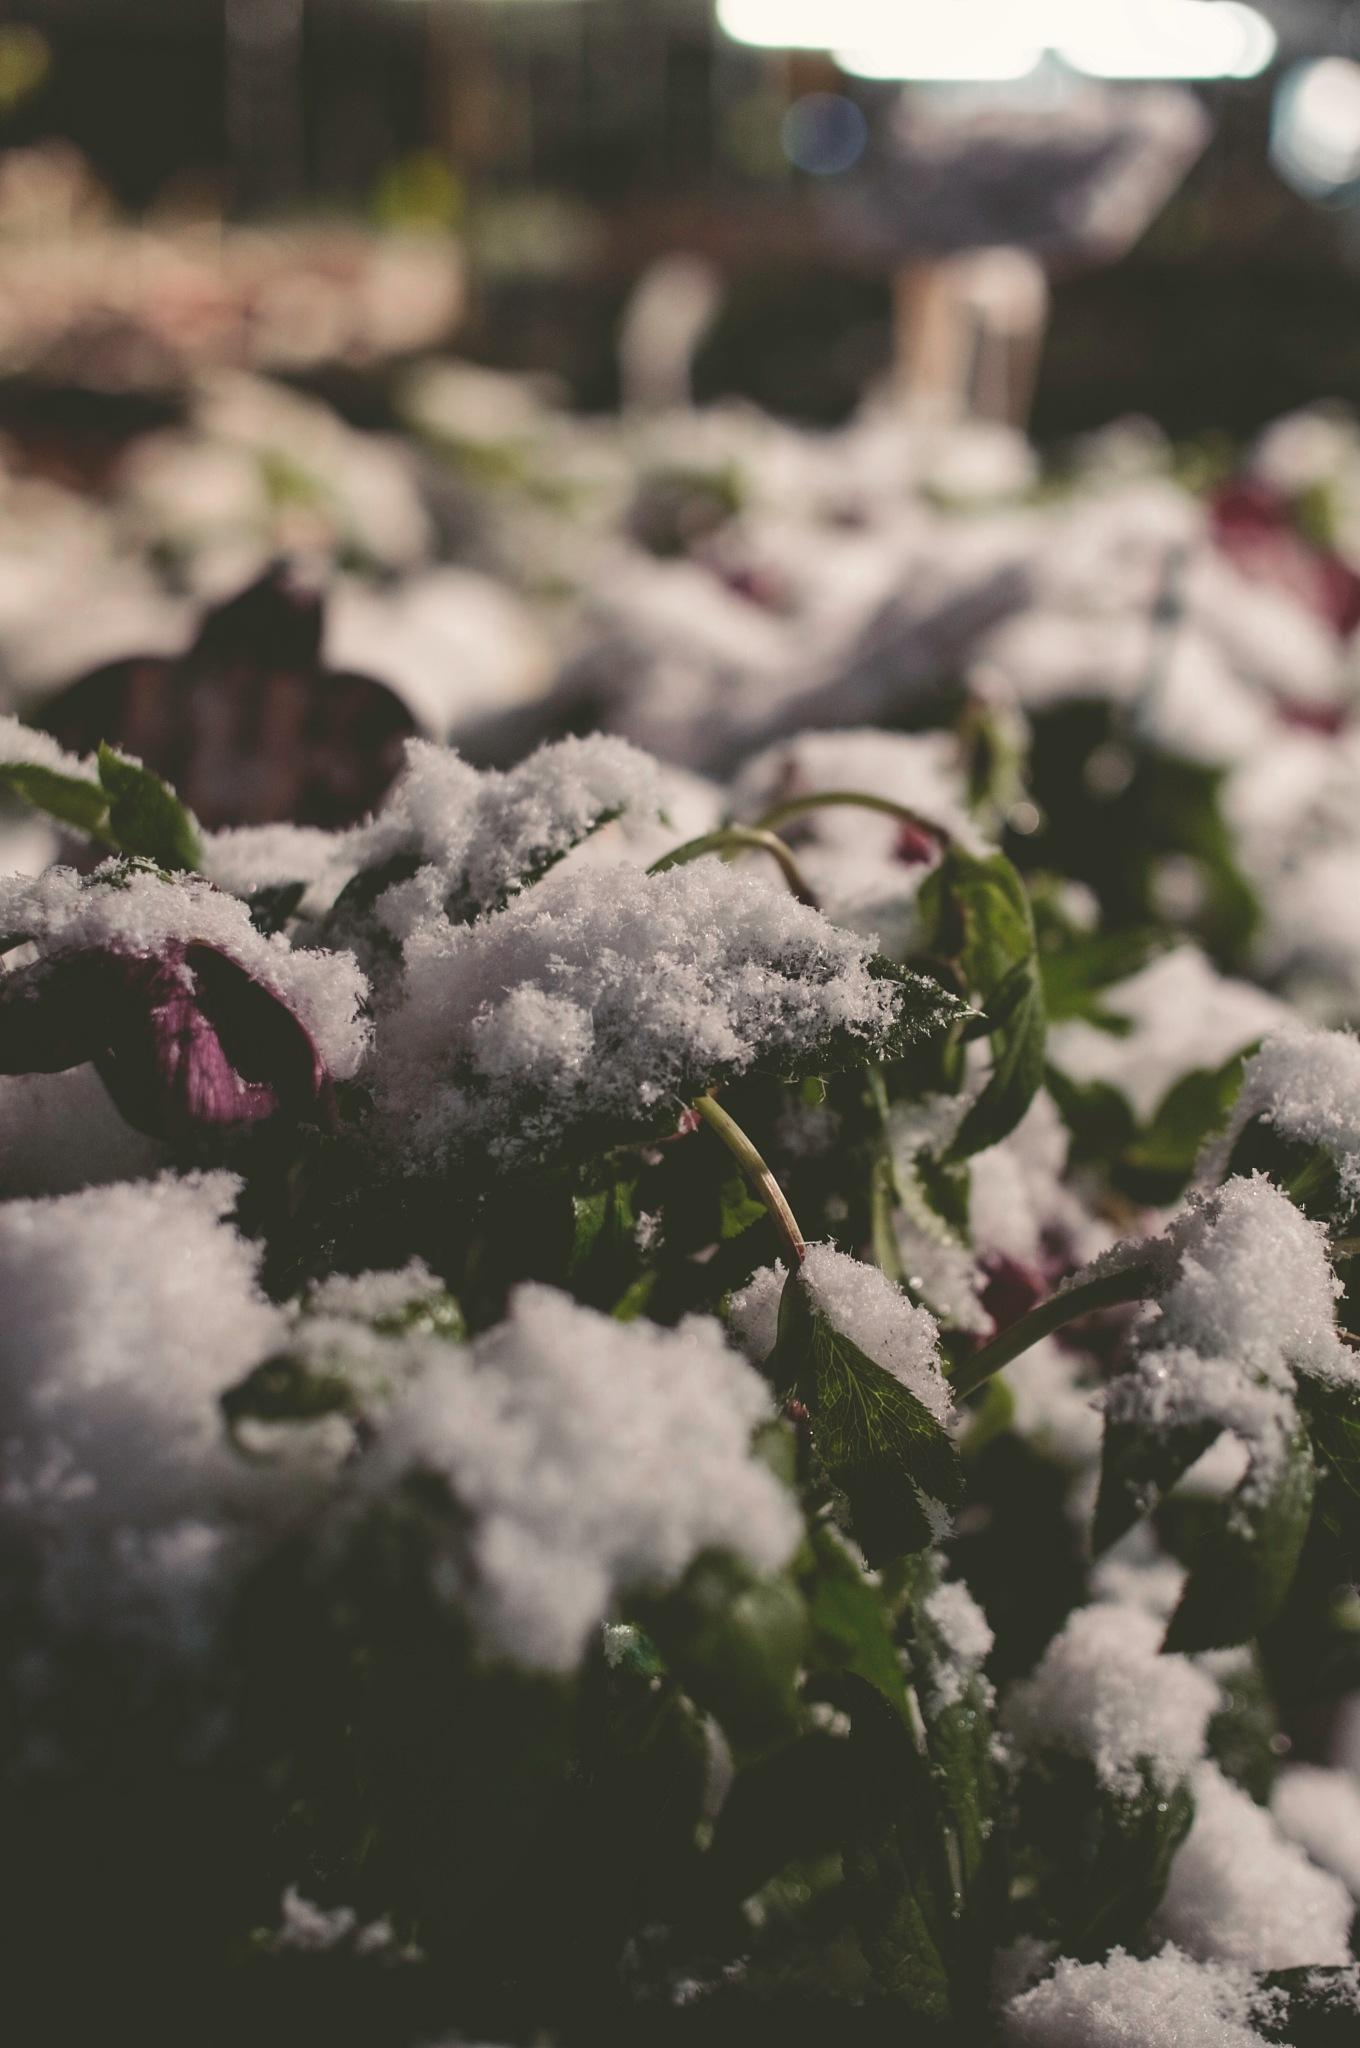 """Snow & Flowers"" - Winter is here  by Goran Jorganovich"